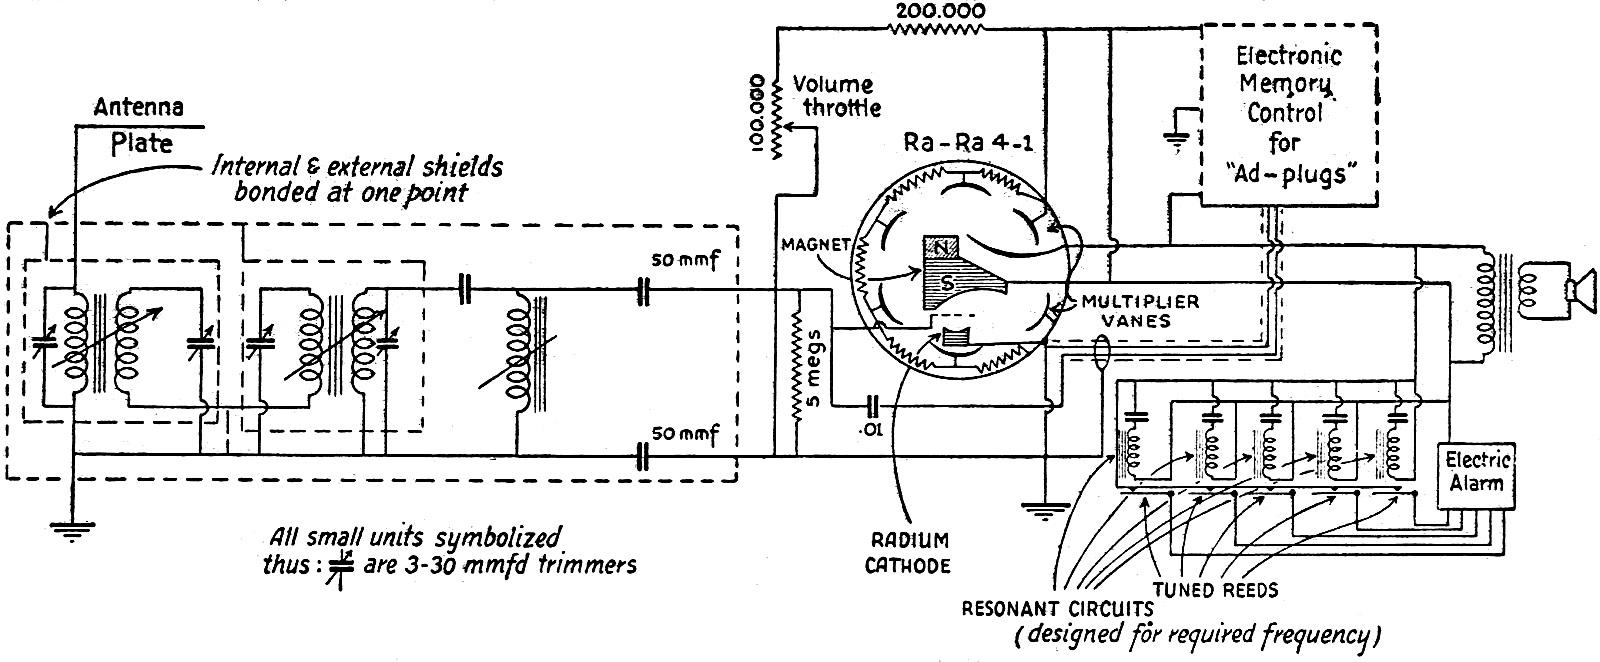 Radium radio receiver april 1944 radio craft rf cafe simplified diagram of the new radium radio set rf cafe pooptronica